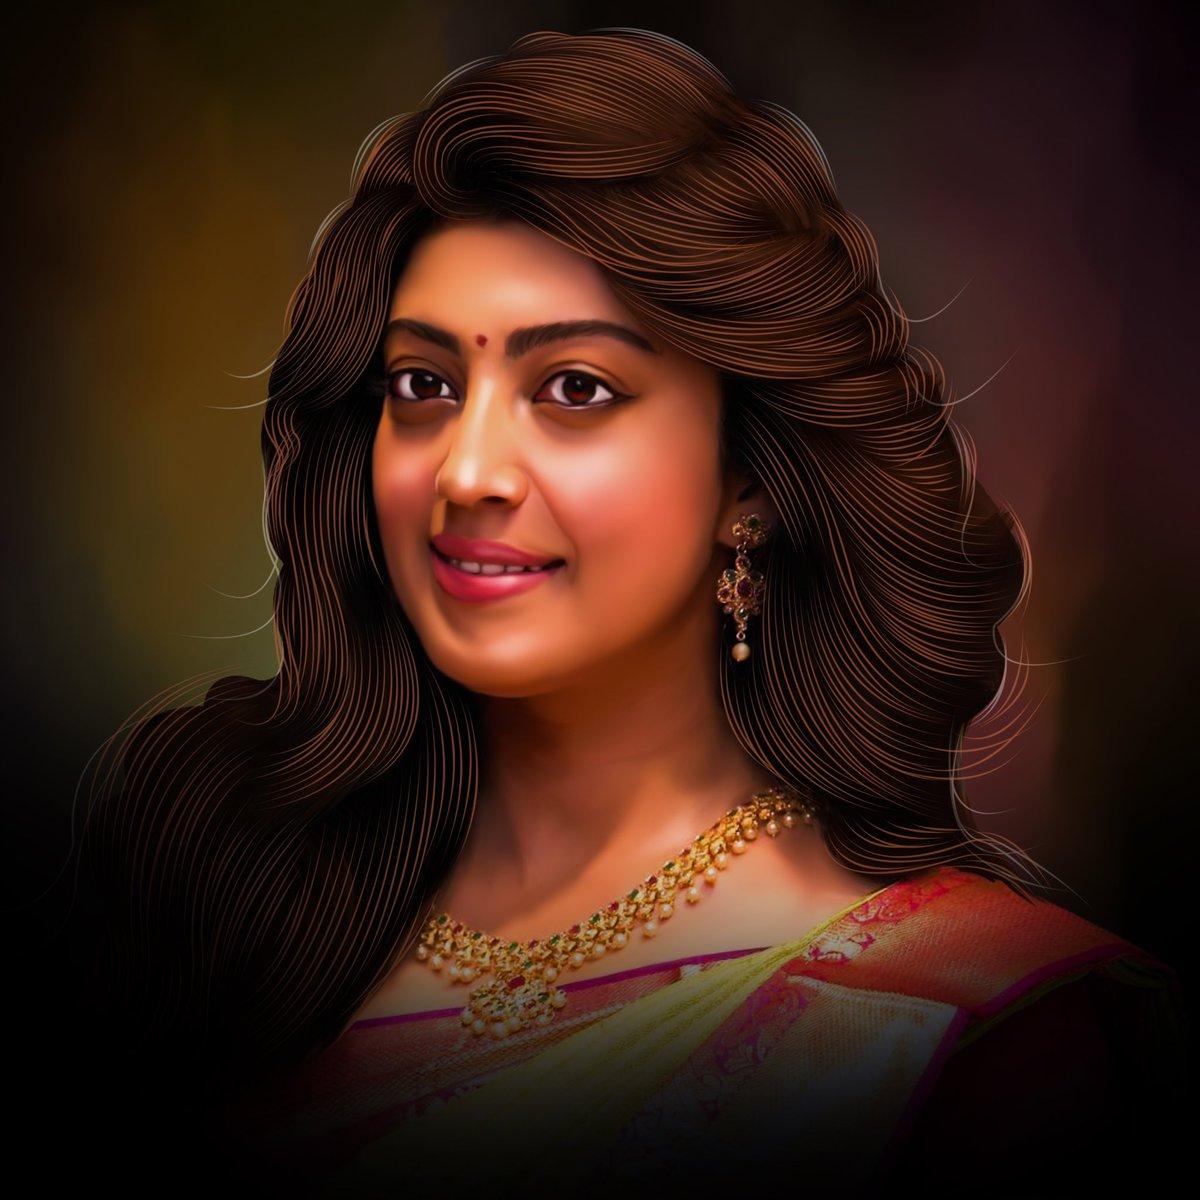 Digital Smudge Art With #Me #Pranitha @pranitasubhashpic.twitter.com/YKA6aOHHI4